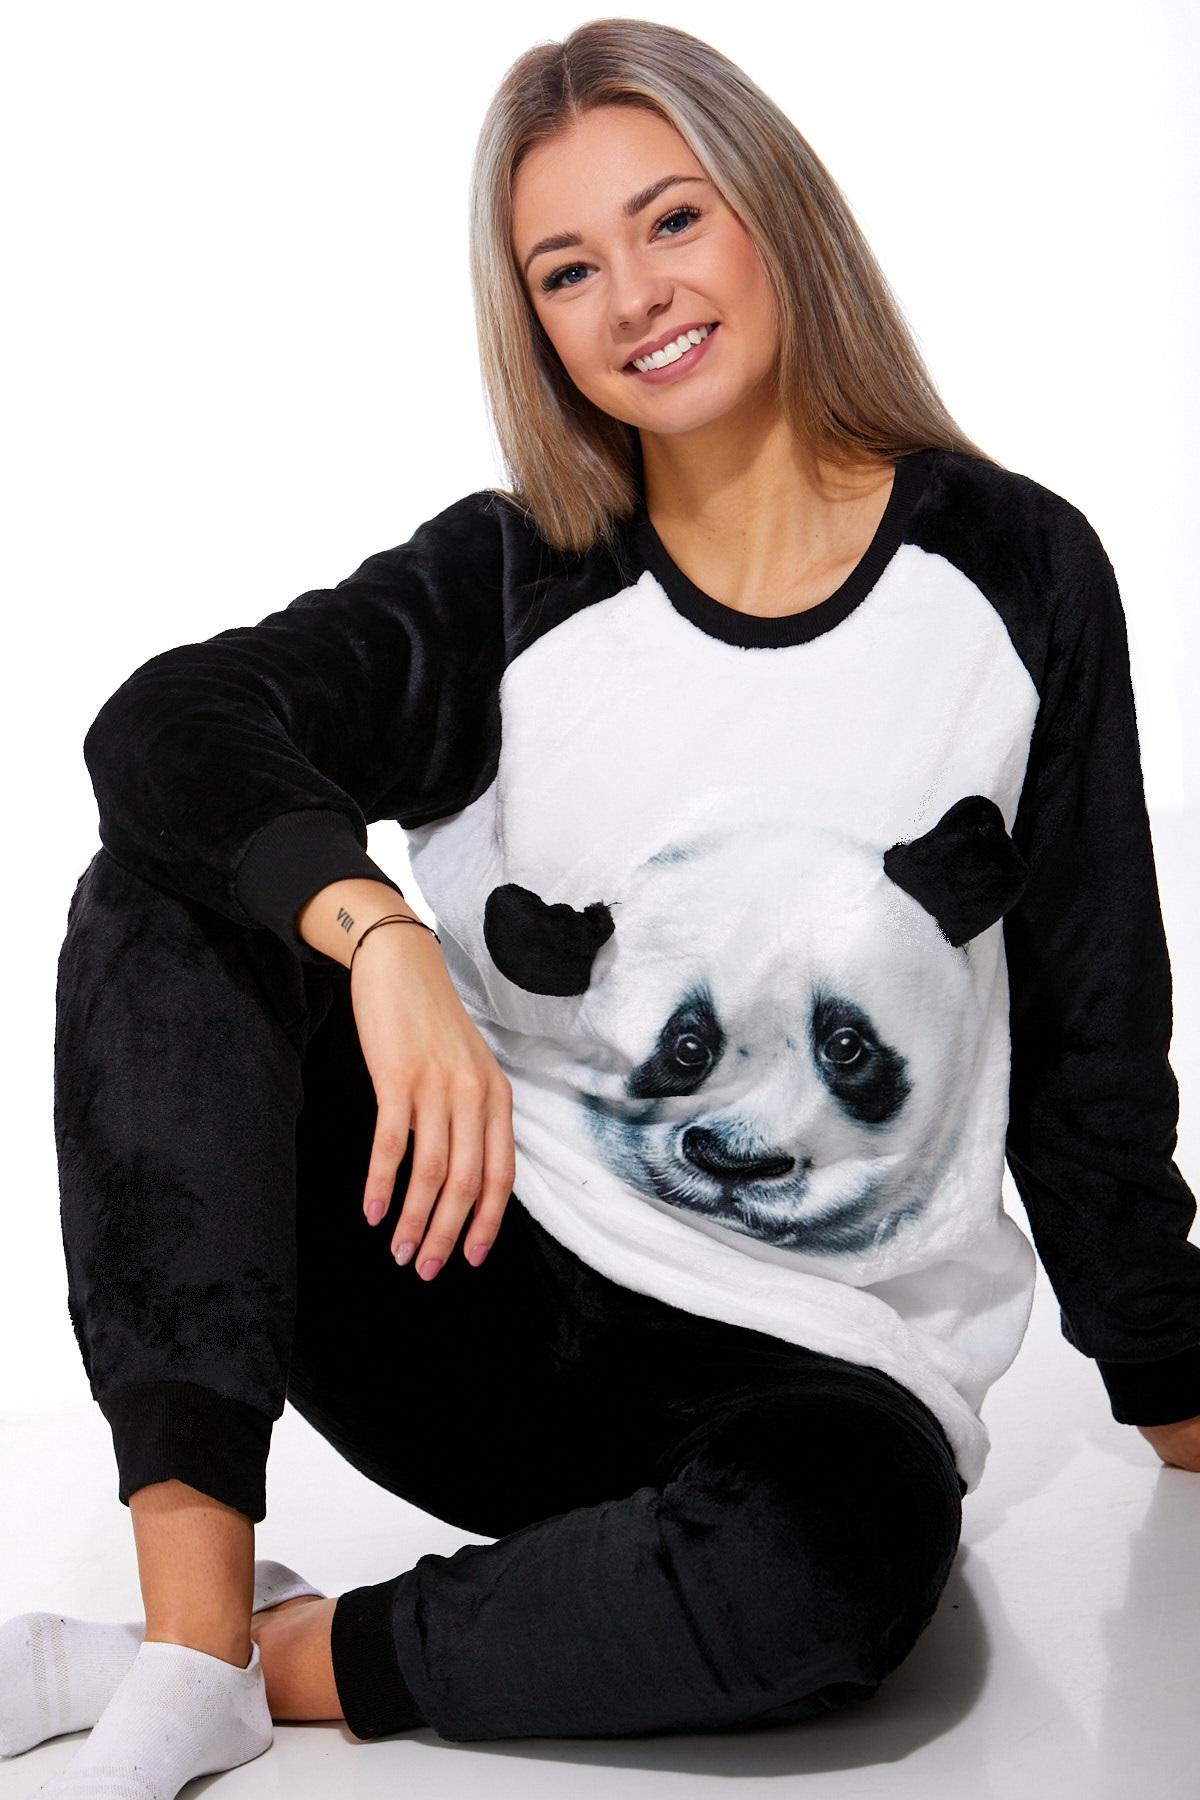 Pyžamo extra teplé pro ženy 1Z0838